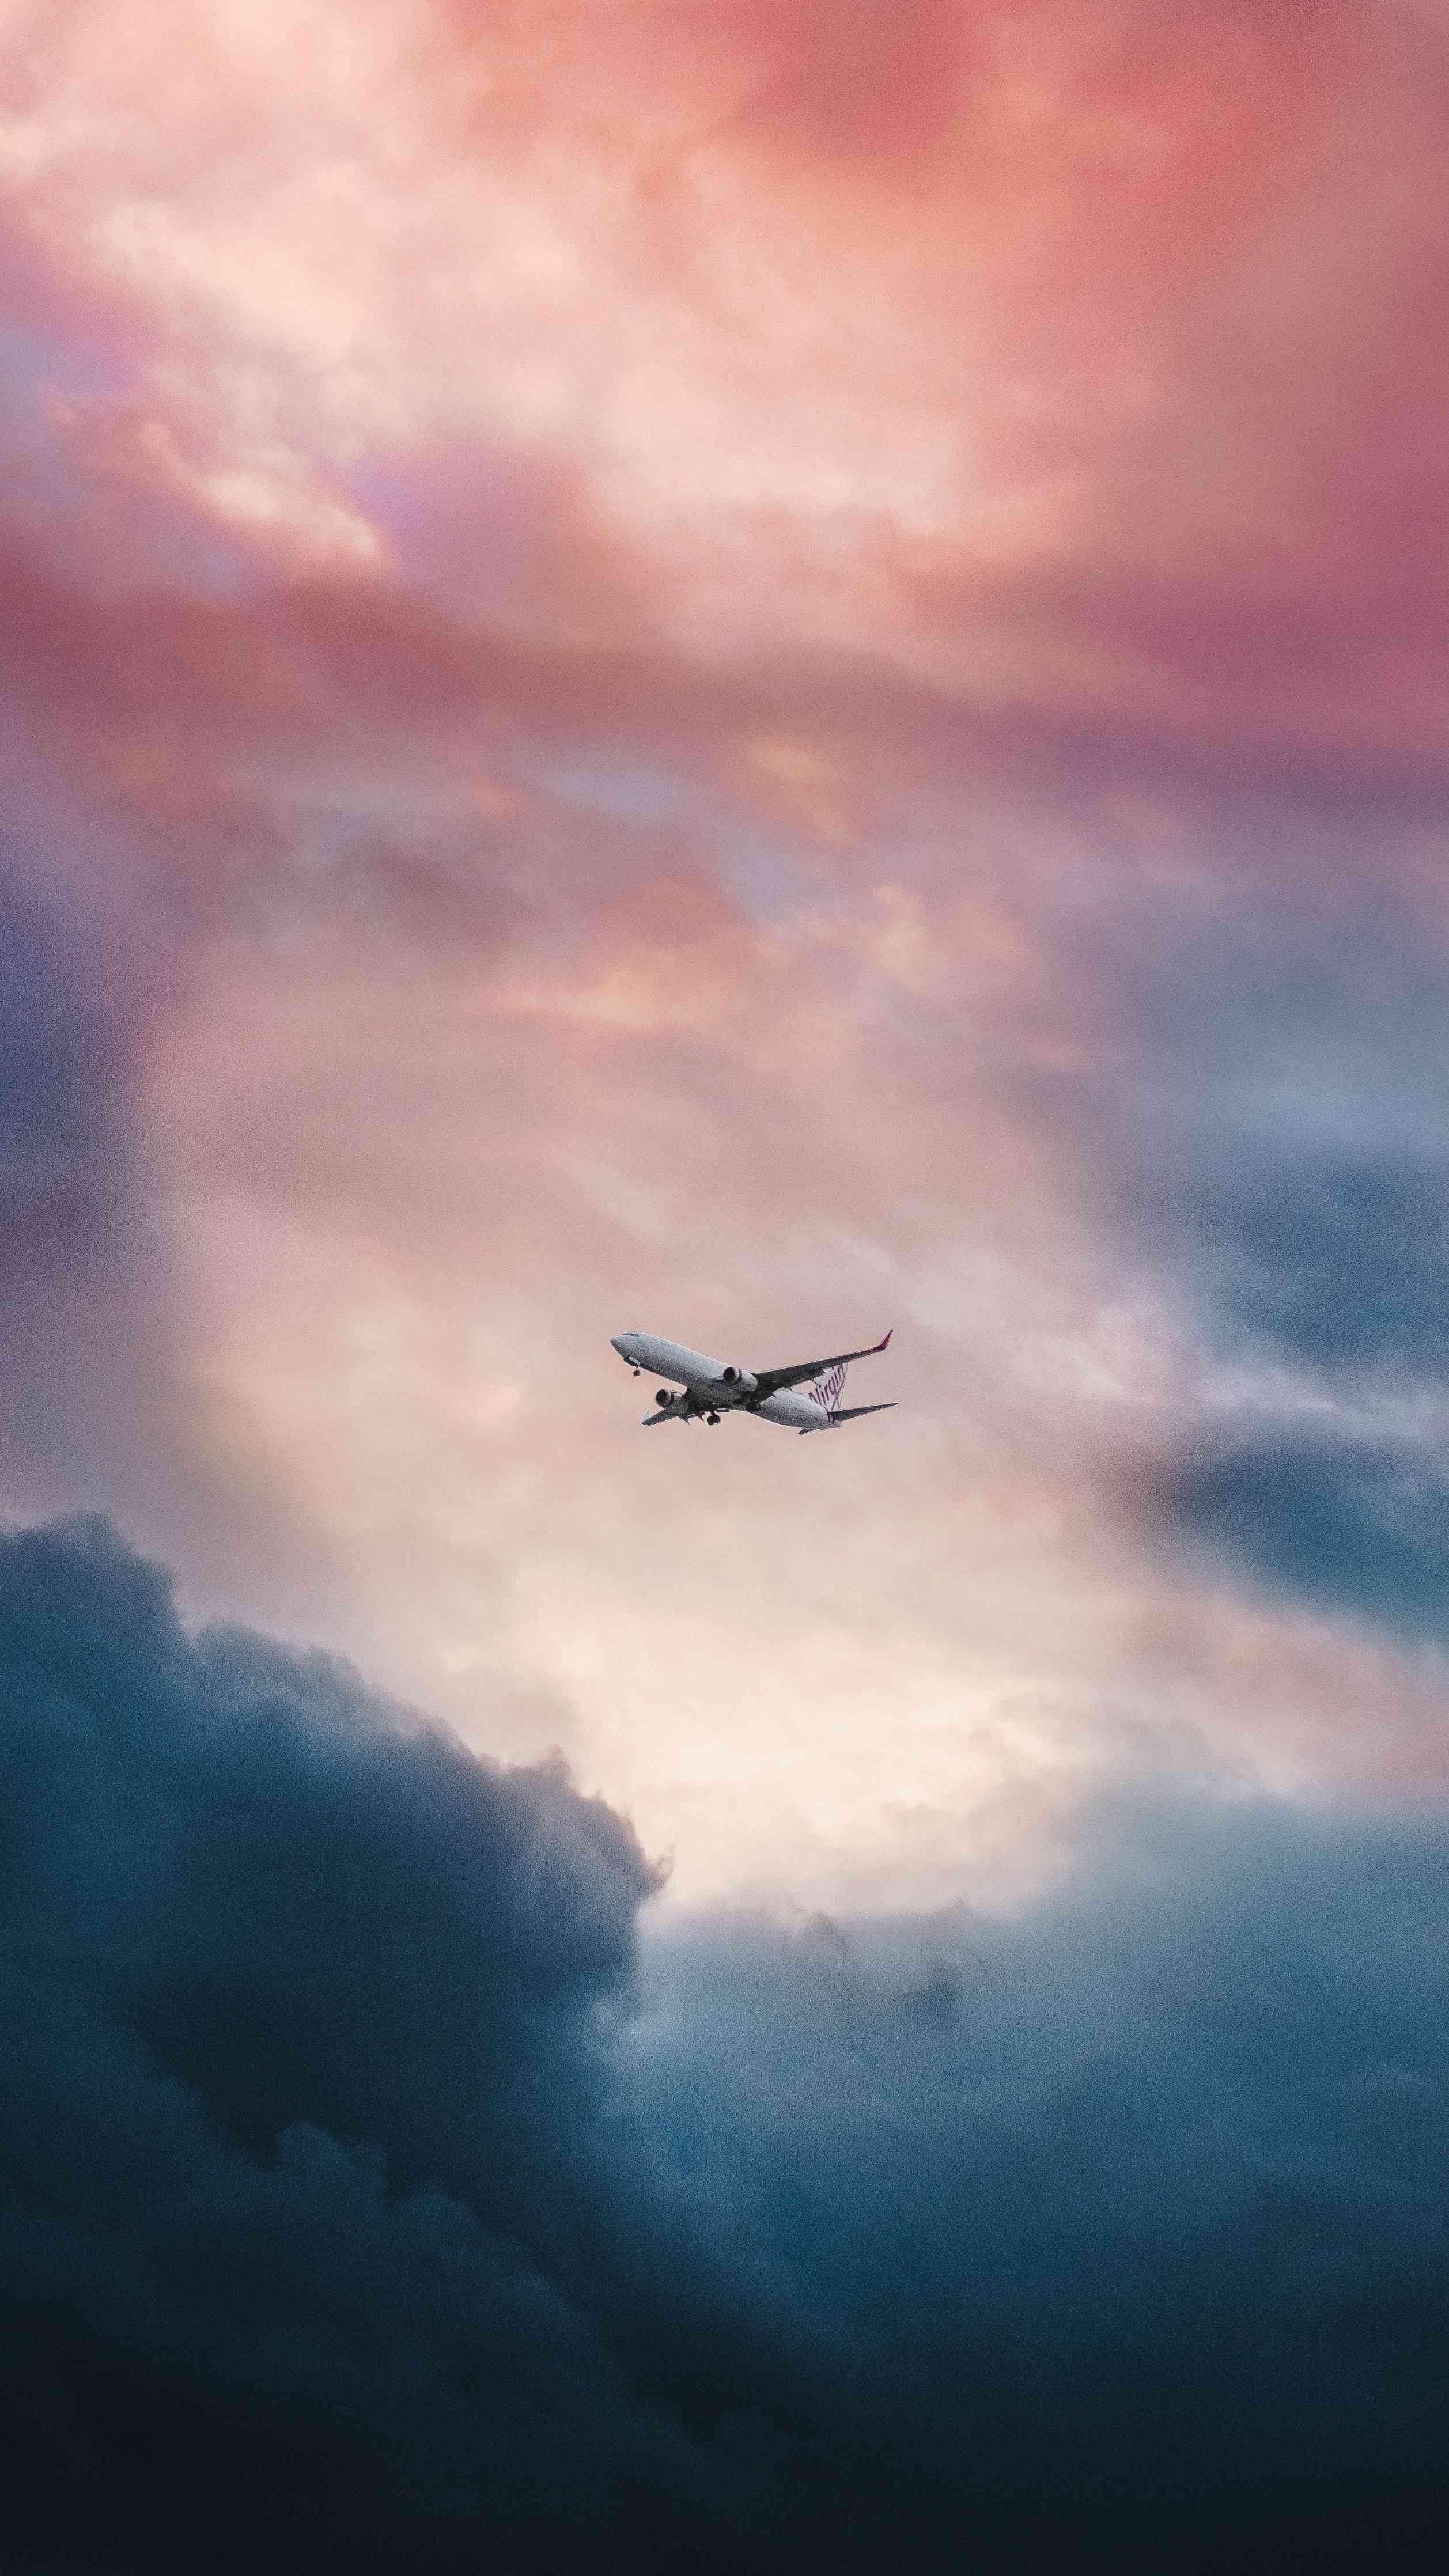 Plane in Sky HD iPhone Wallpaper